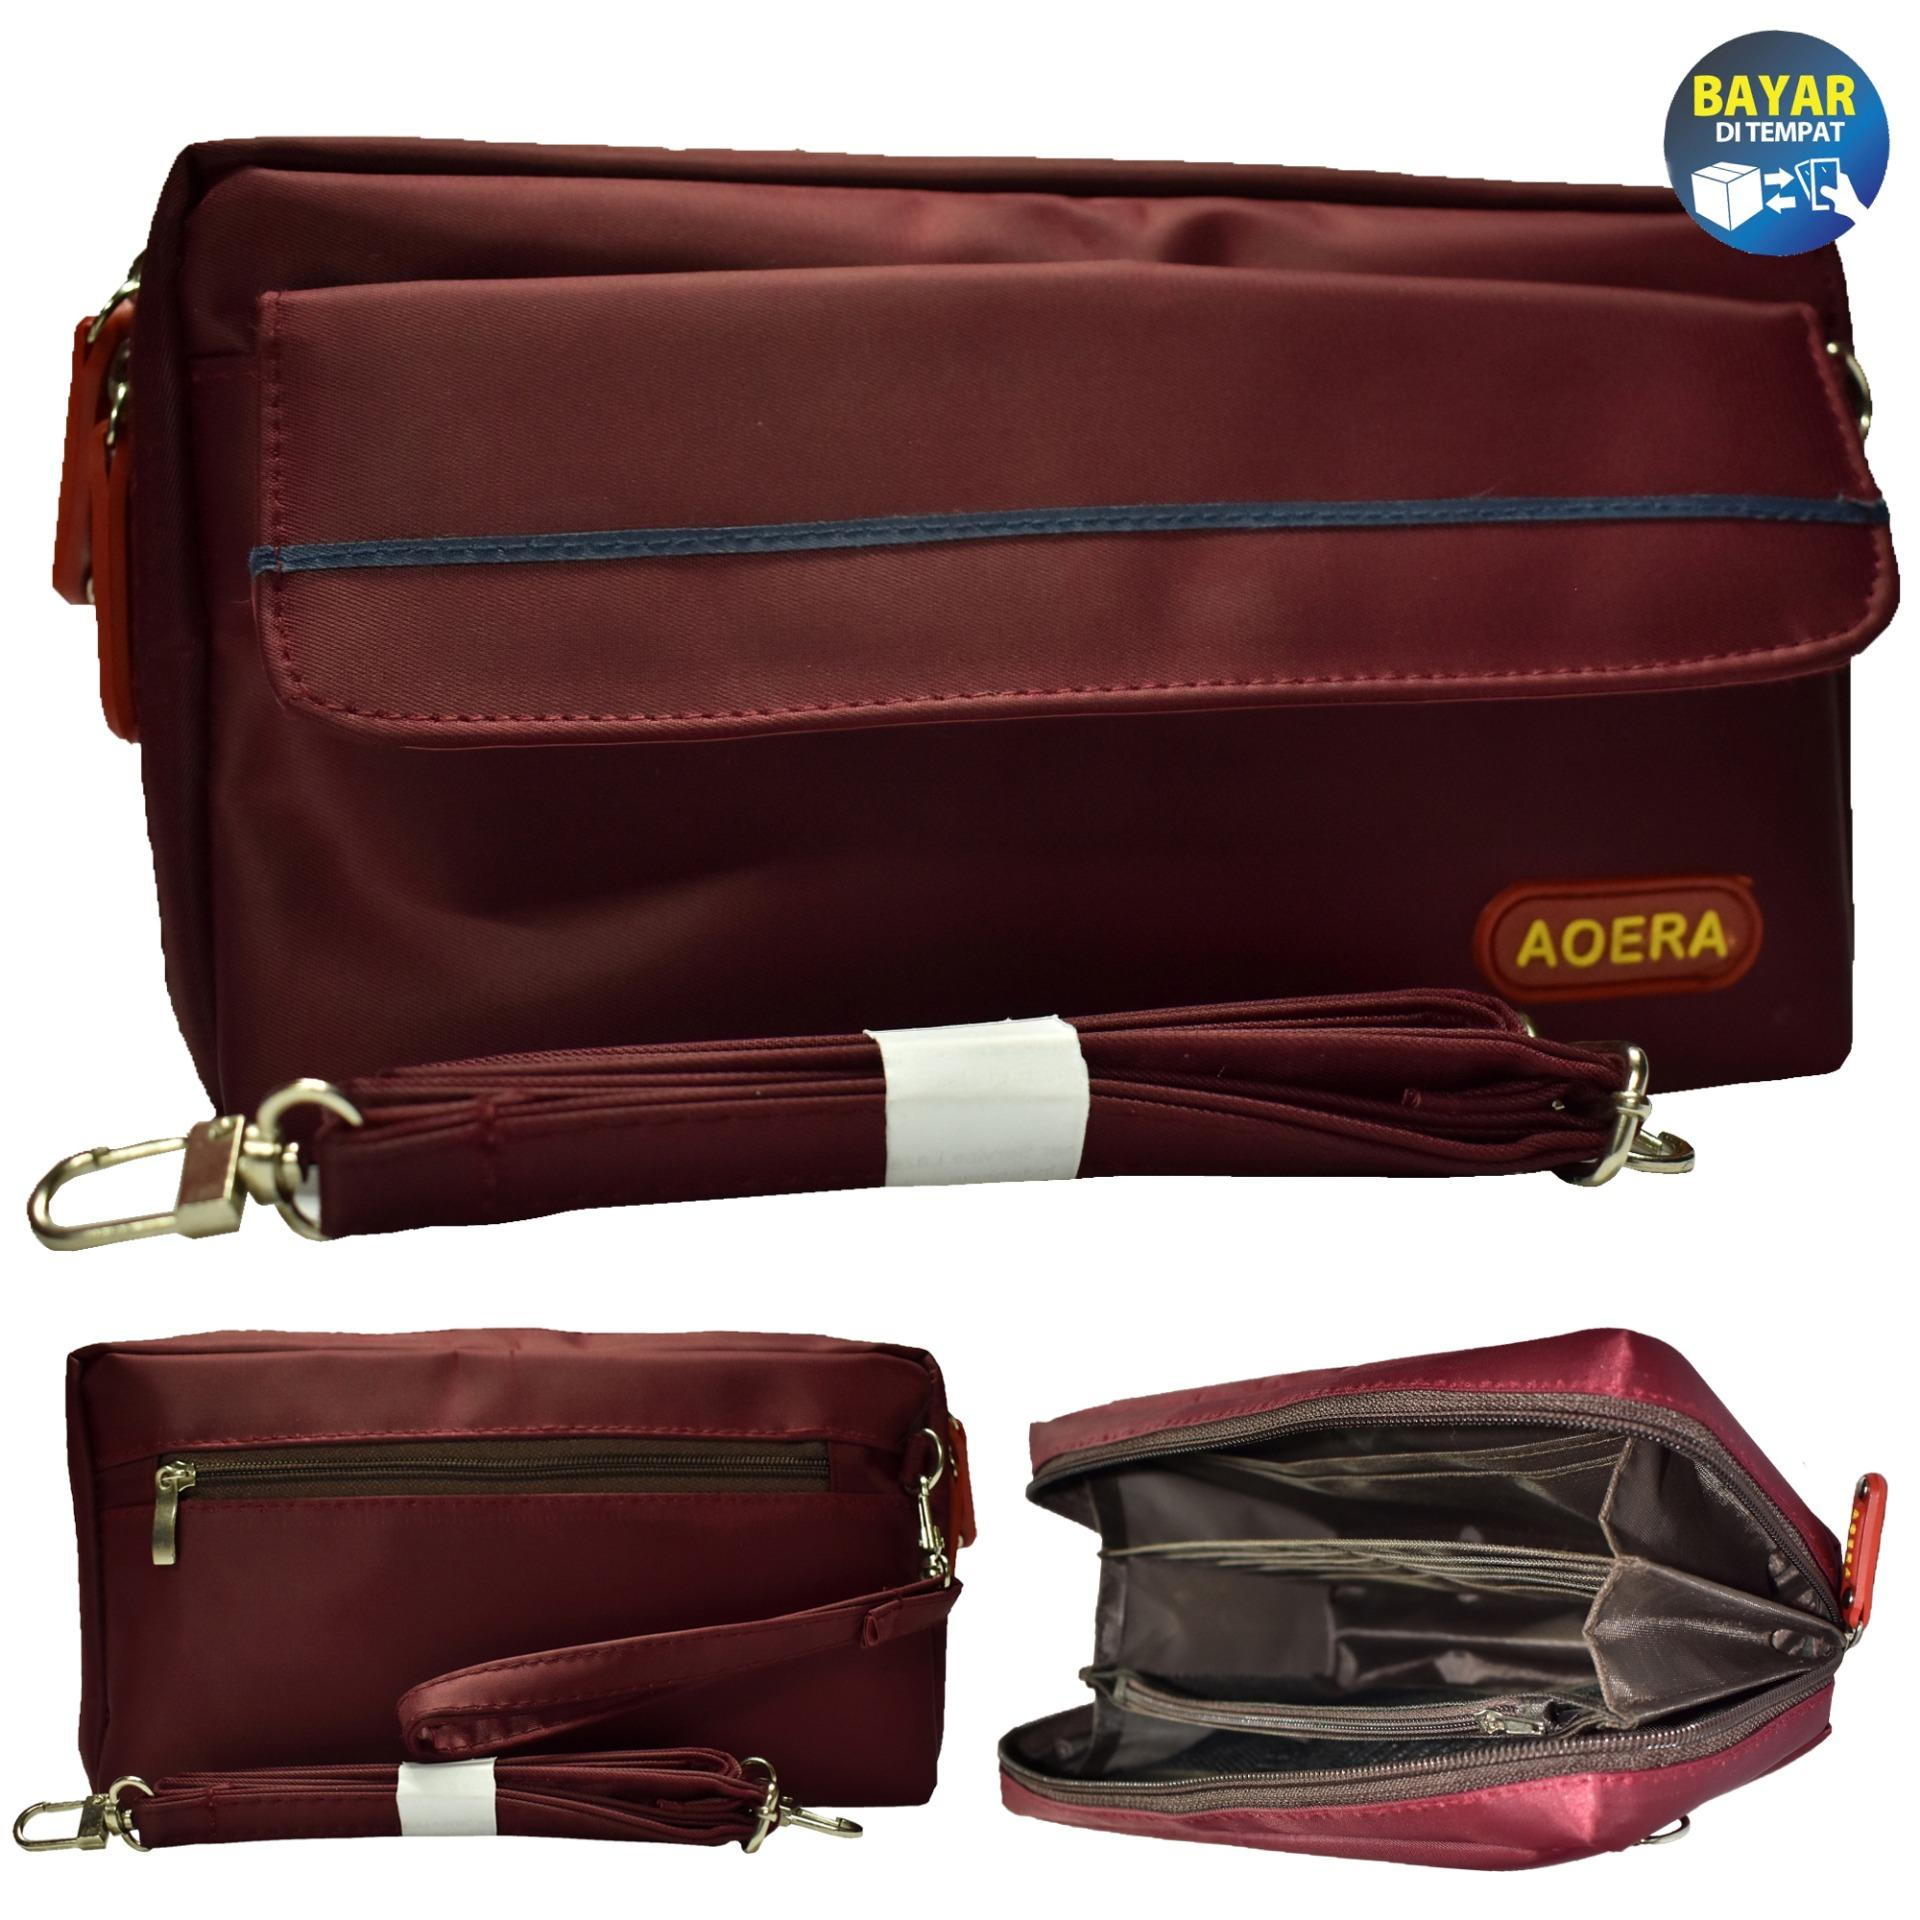 Tas wanita / Taswanita / Tas selempang wanita / Dompet Handphone / Dompet Hpo / Dompet hp / Slingbag Hpo Aoera  - Merah marun